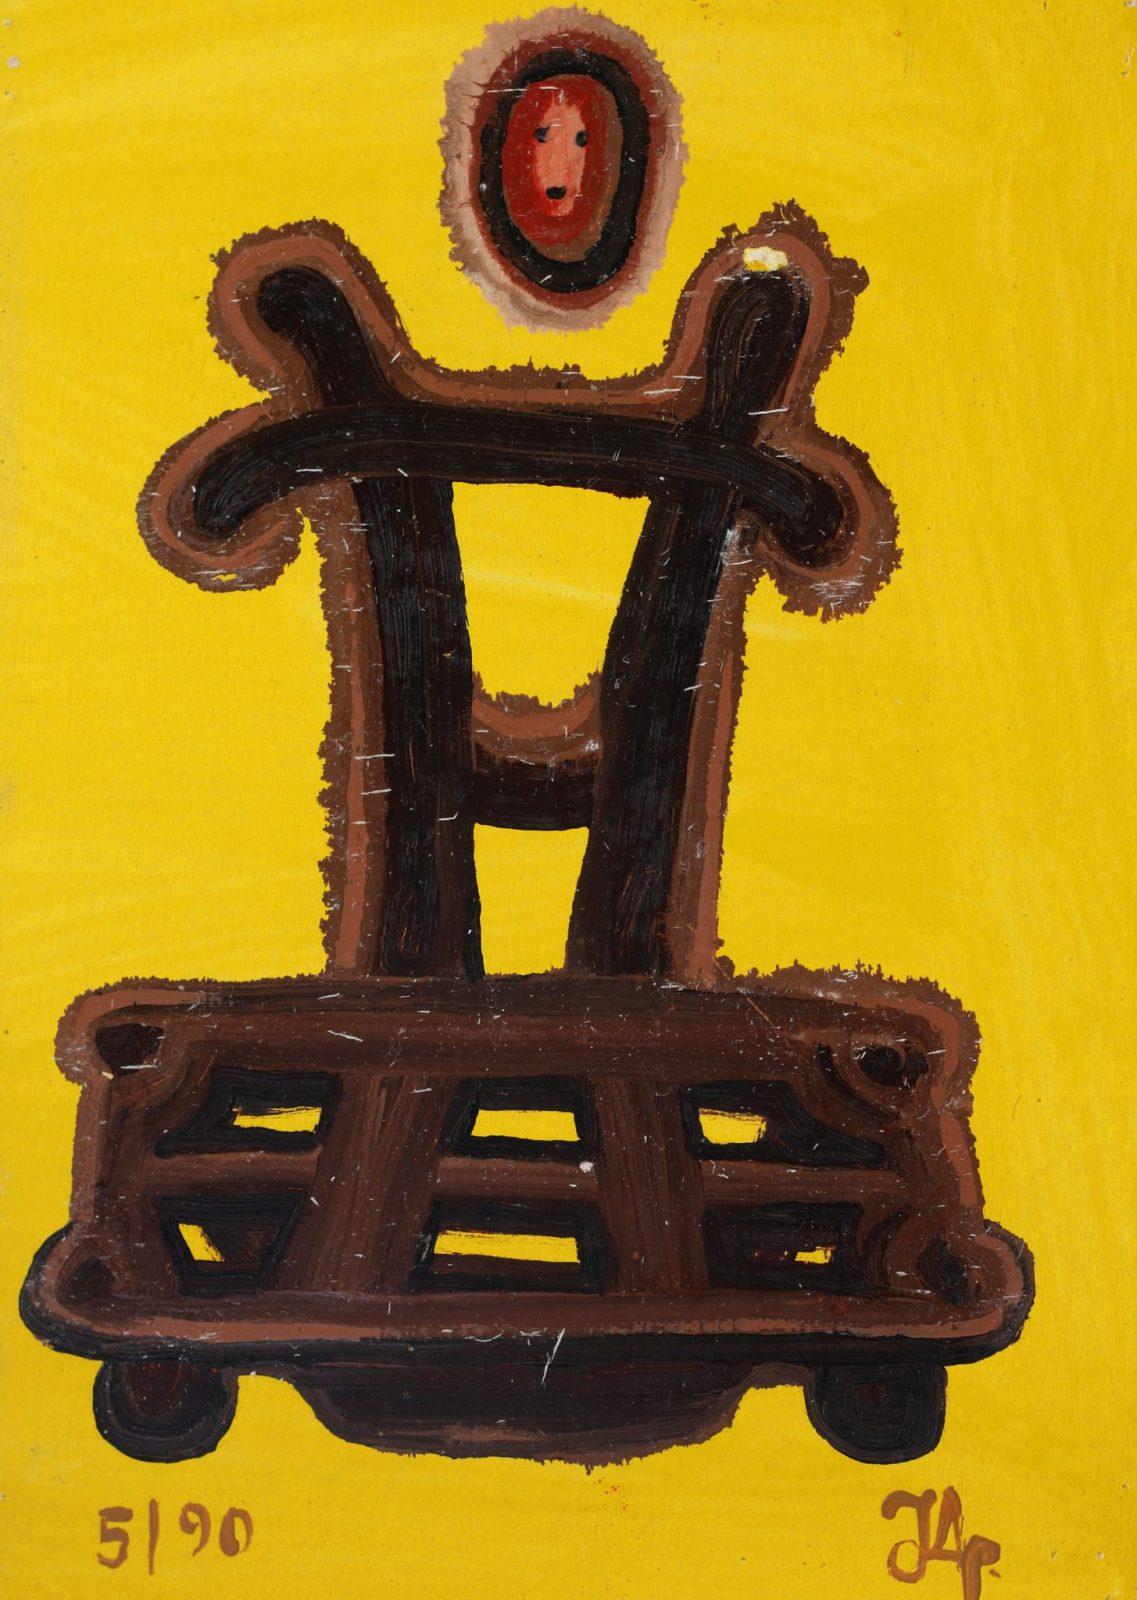 Man & Chair | Yellow #4